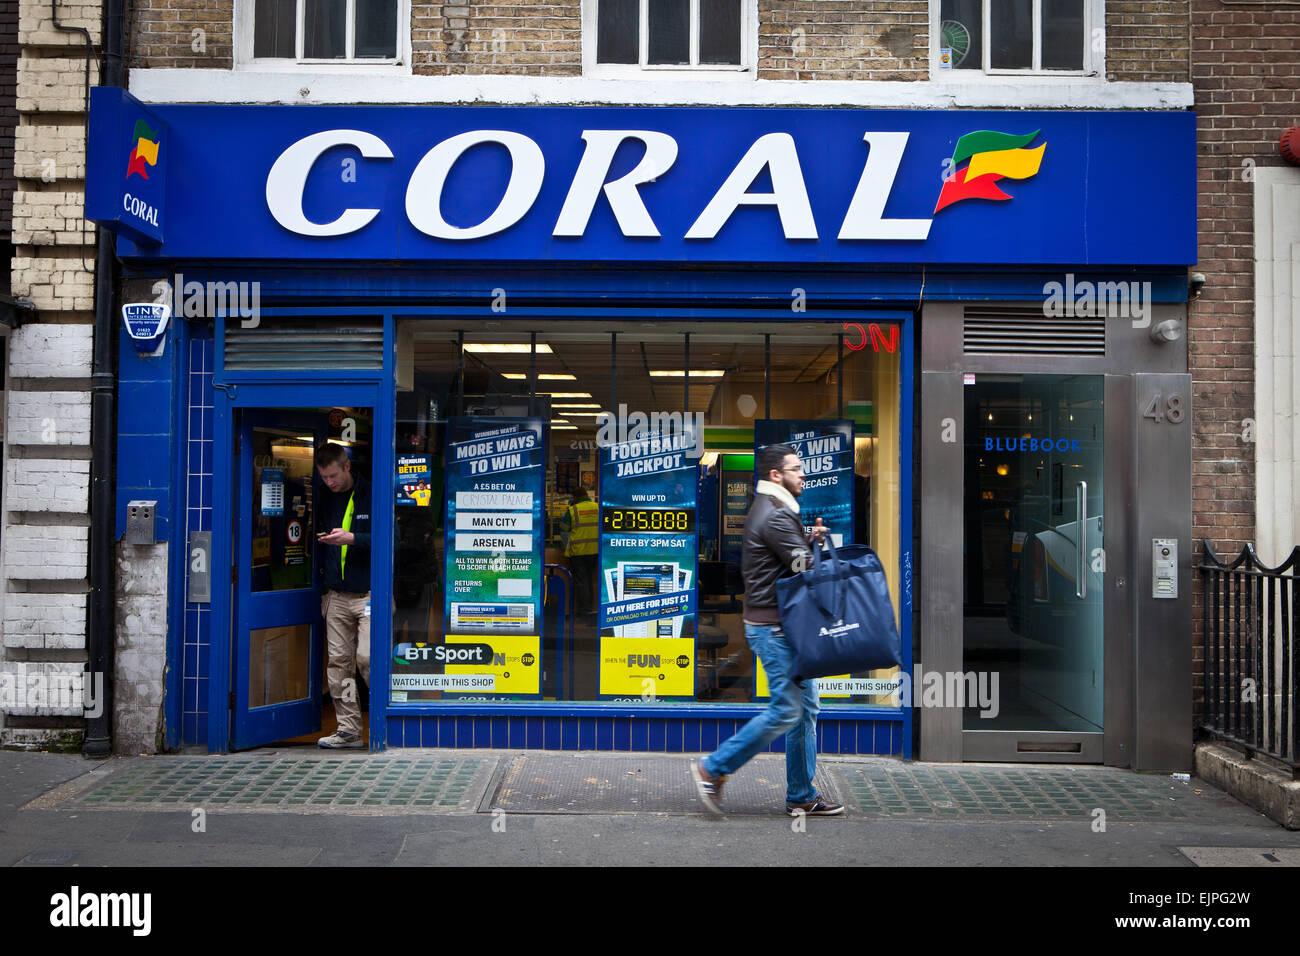 Coral betting shop icb csgo betting sights